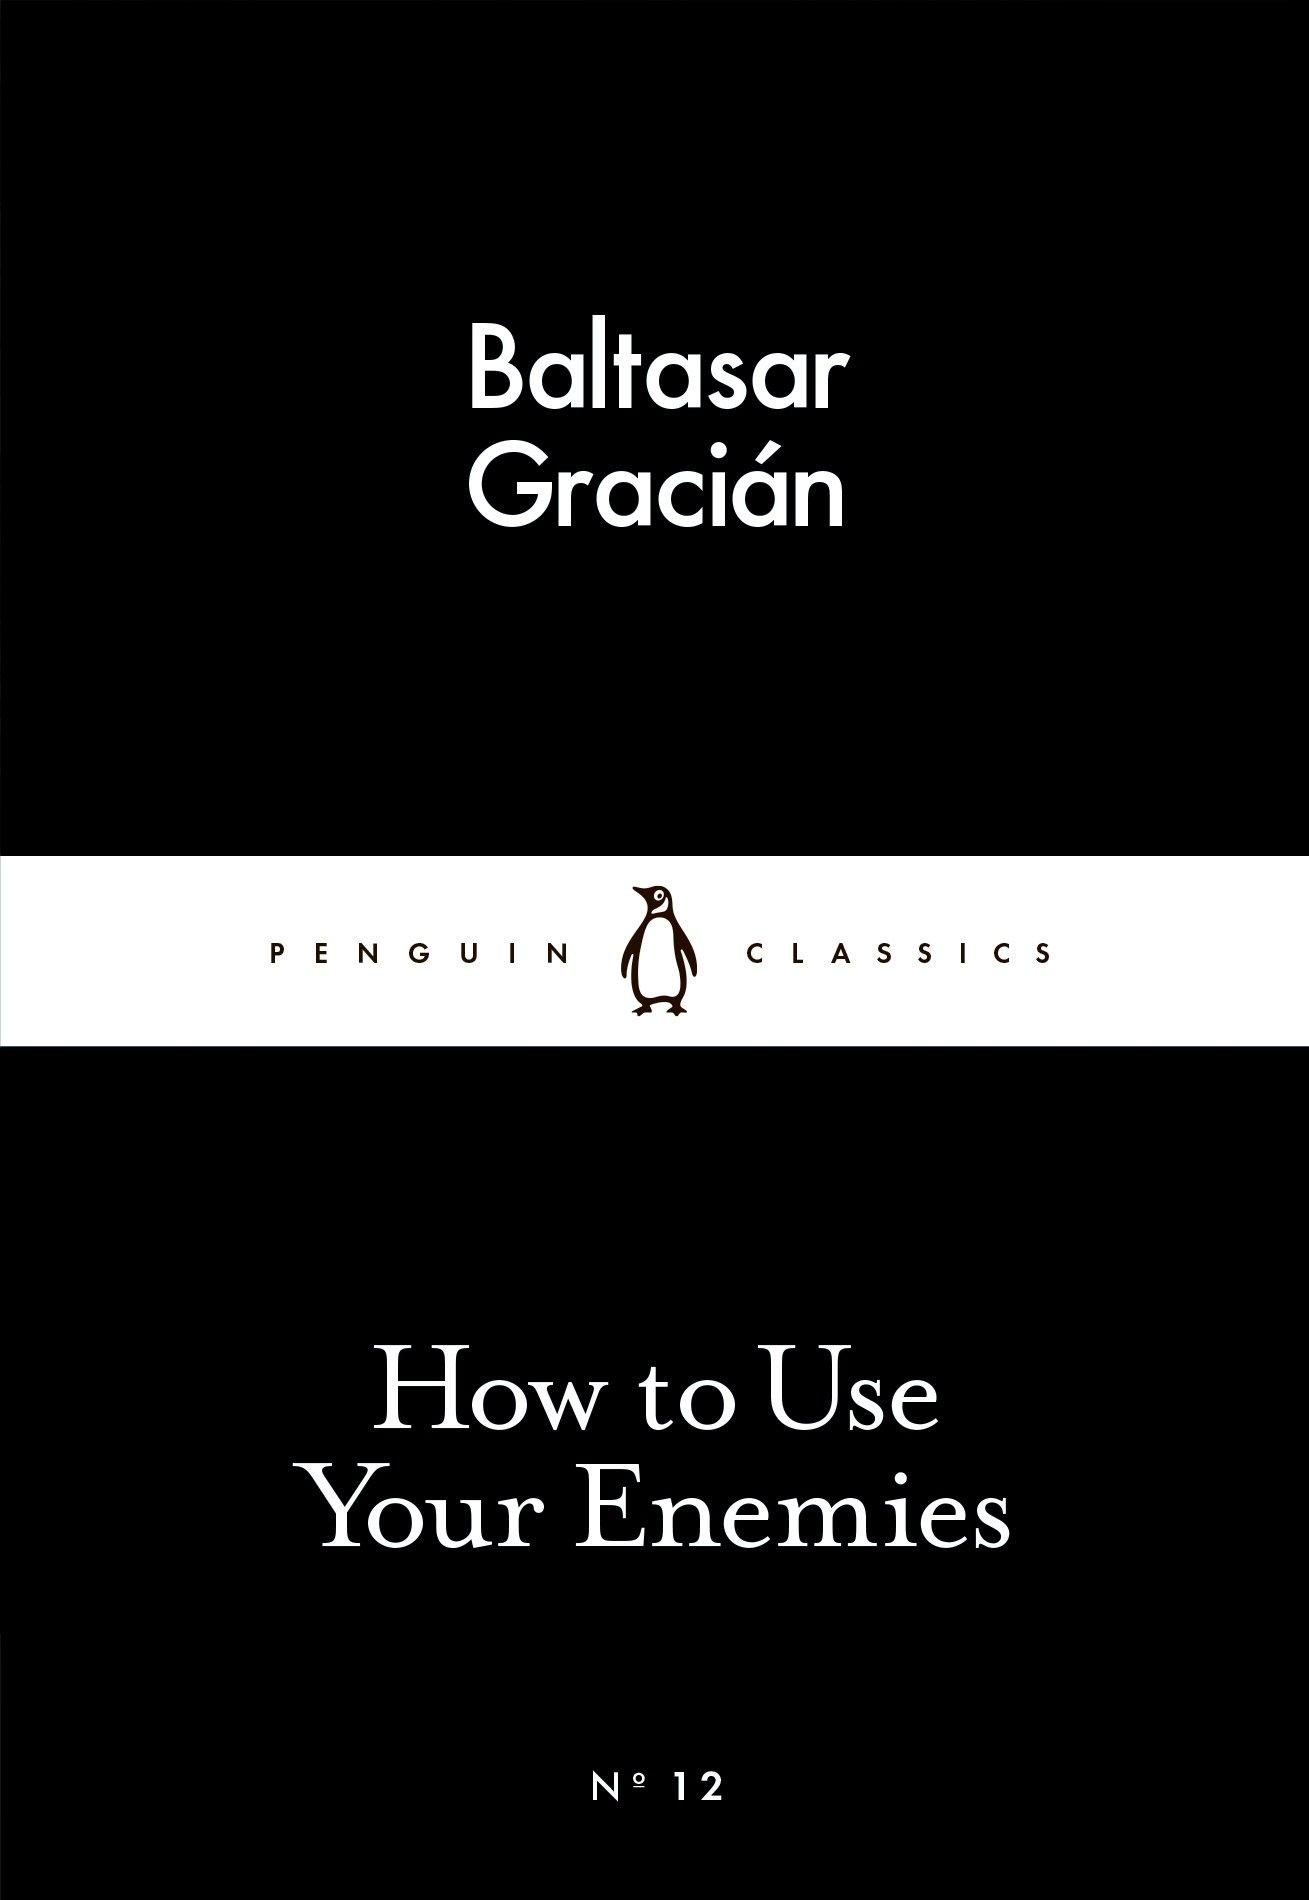 Little Black Classics How To Use Your Enemies Penguin Baltasar Gracian 9780141398273 Amazon Books